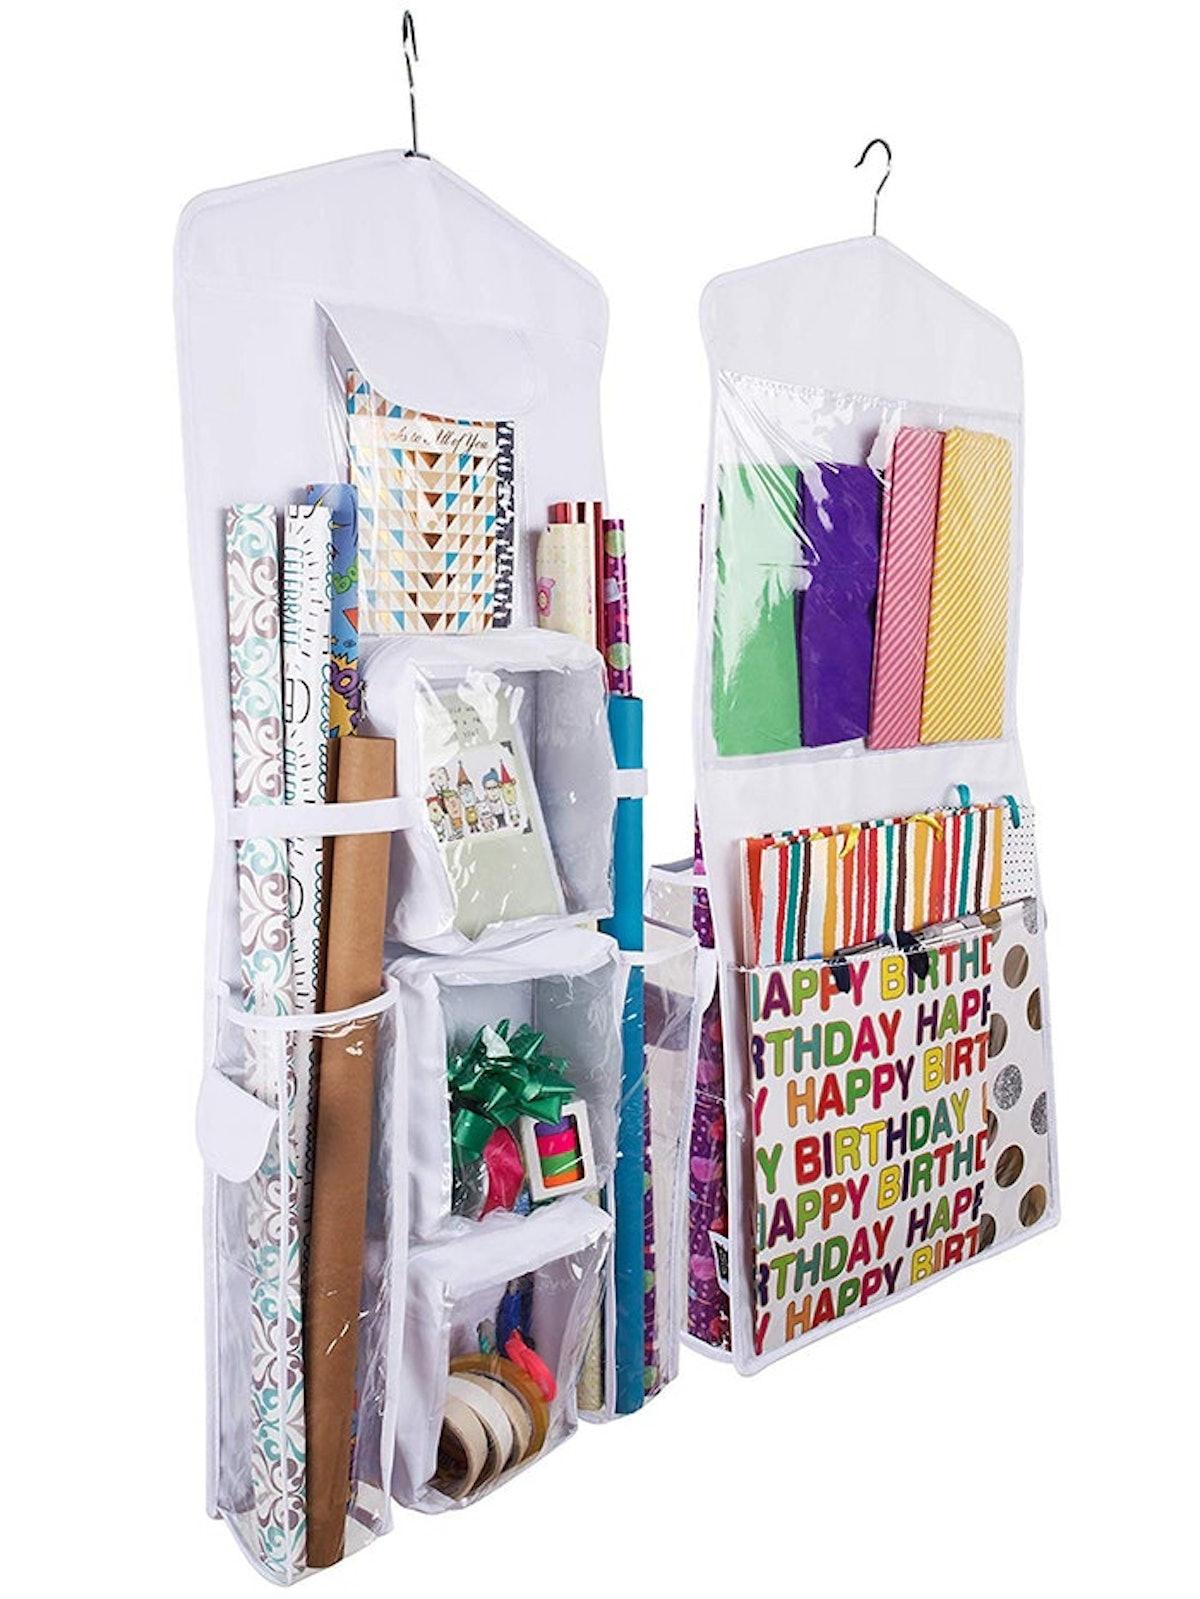 Regal Bazaar Hanging Gift Wrap Organizer